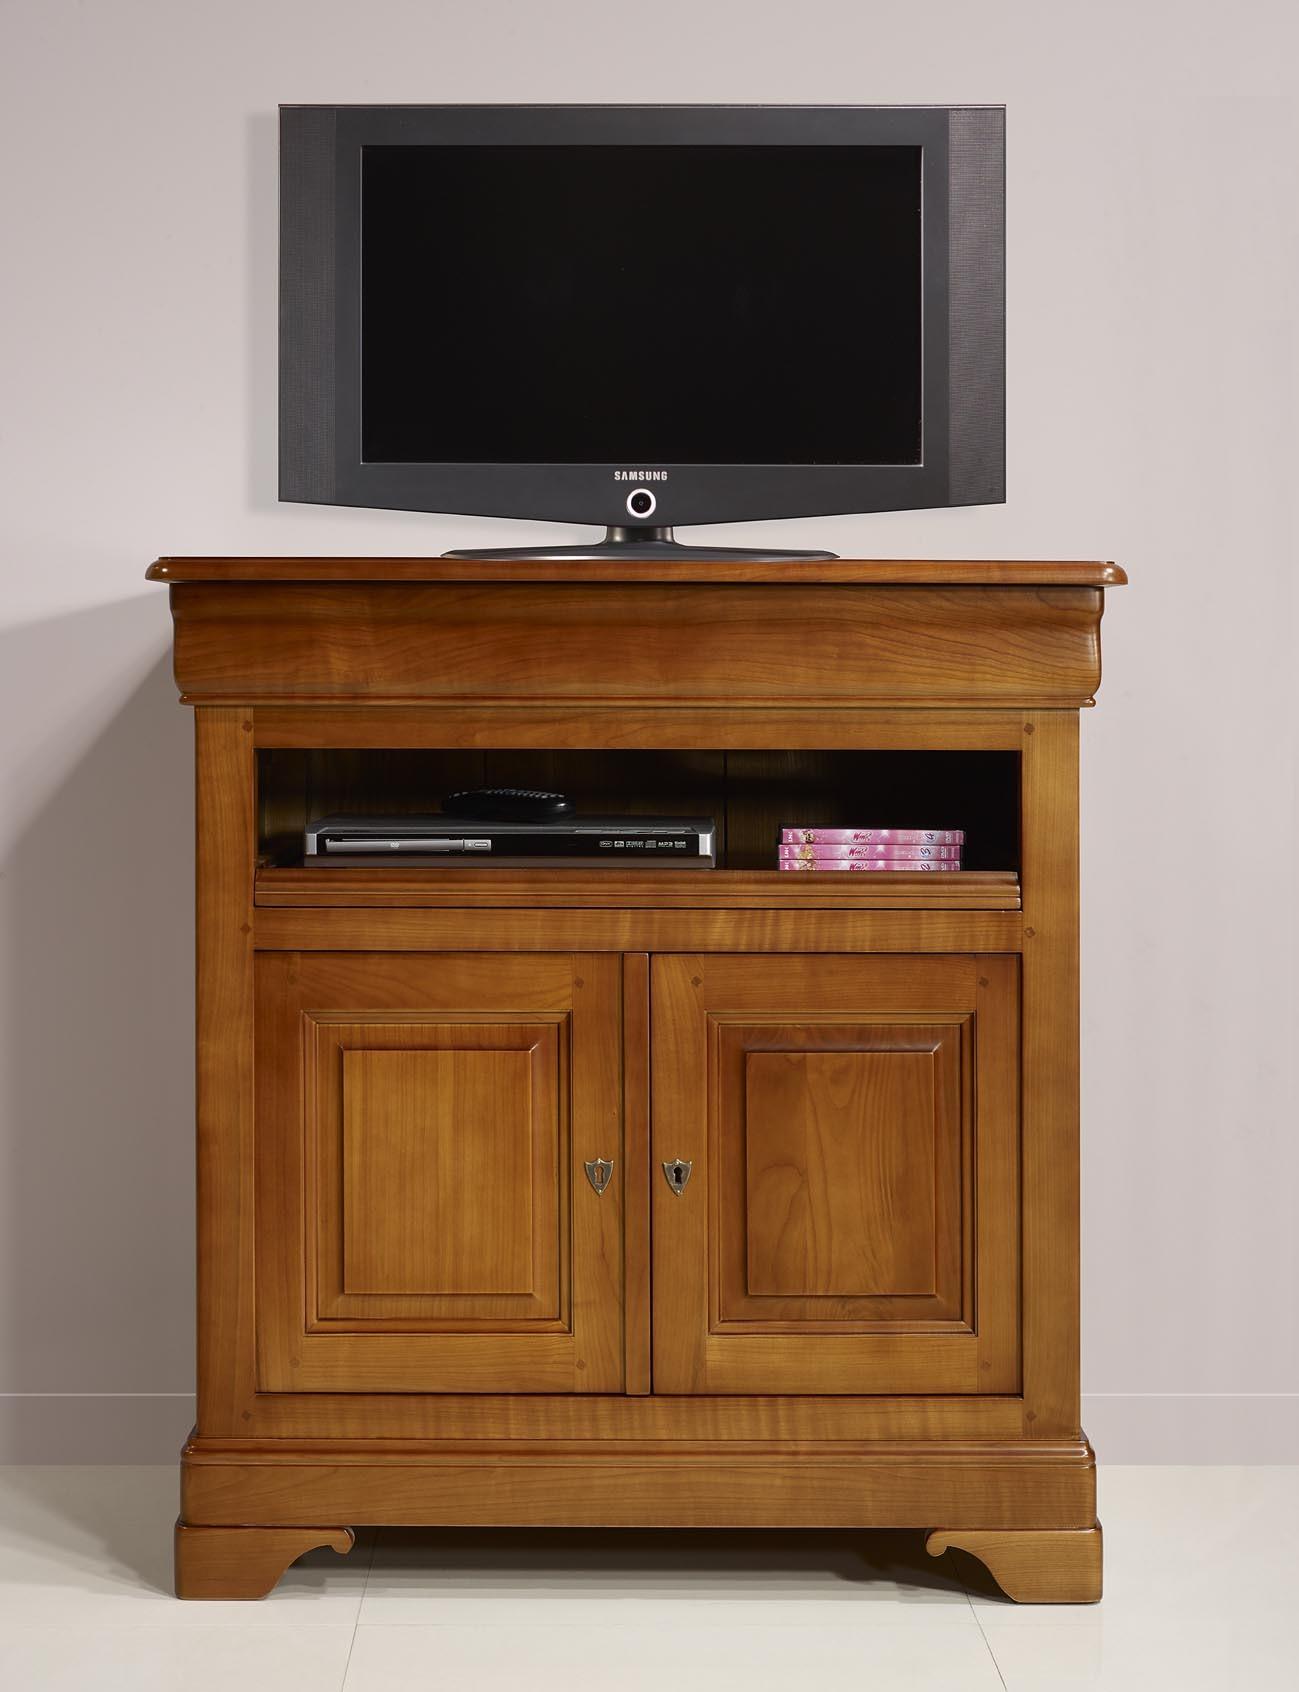 Meuble tv 2 portes le en merisier massif de style louis for Meuble tv merisier